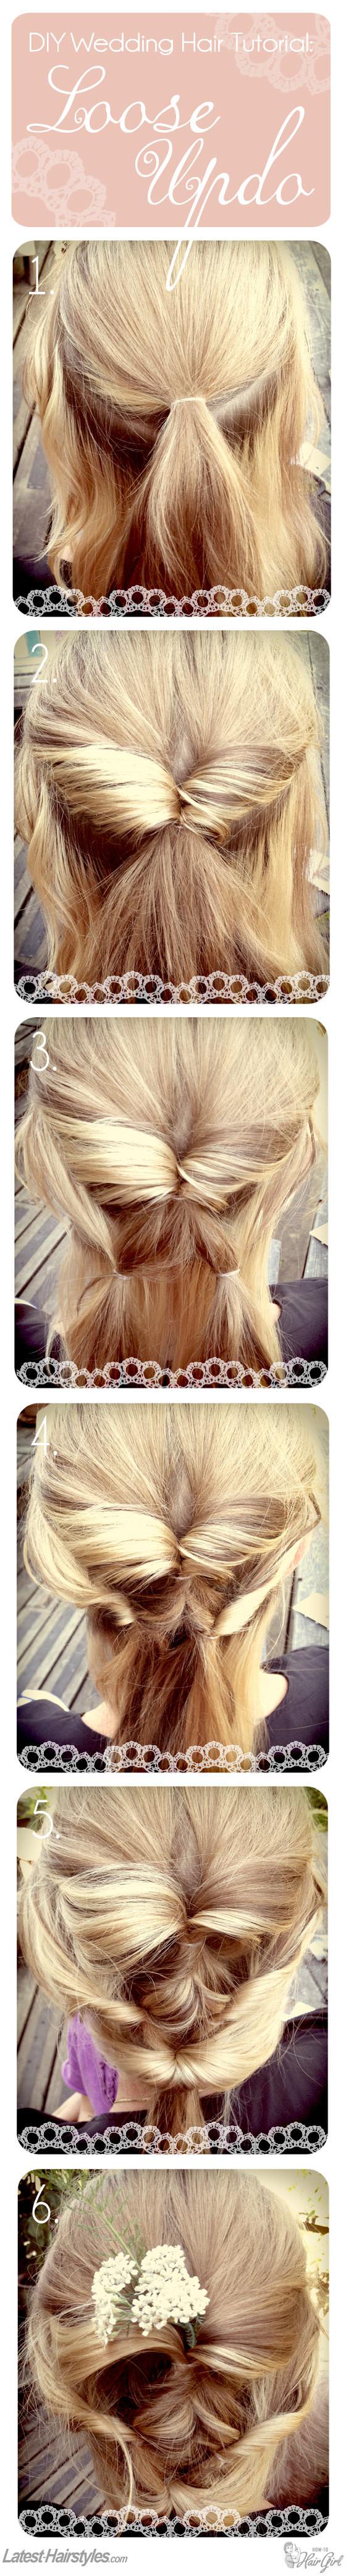 DIY Wedding Hair Tutorial: A Beautifully Loose Updo